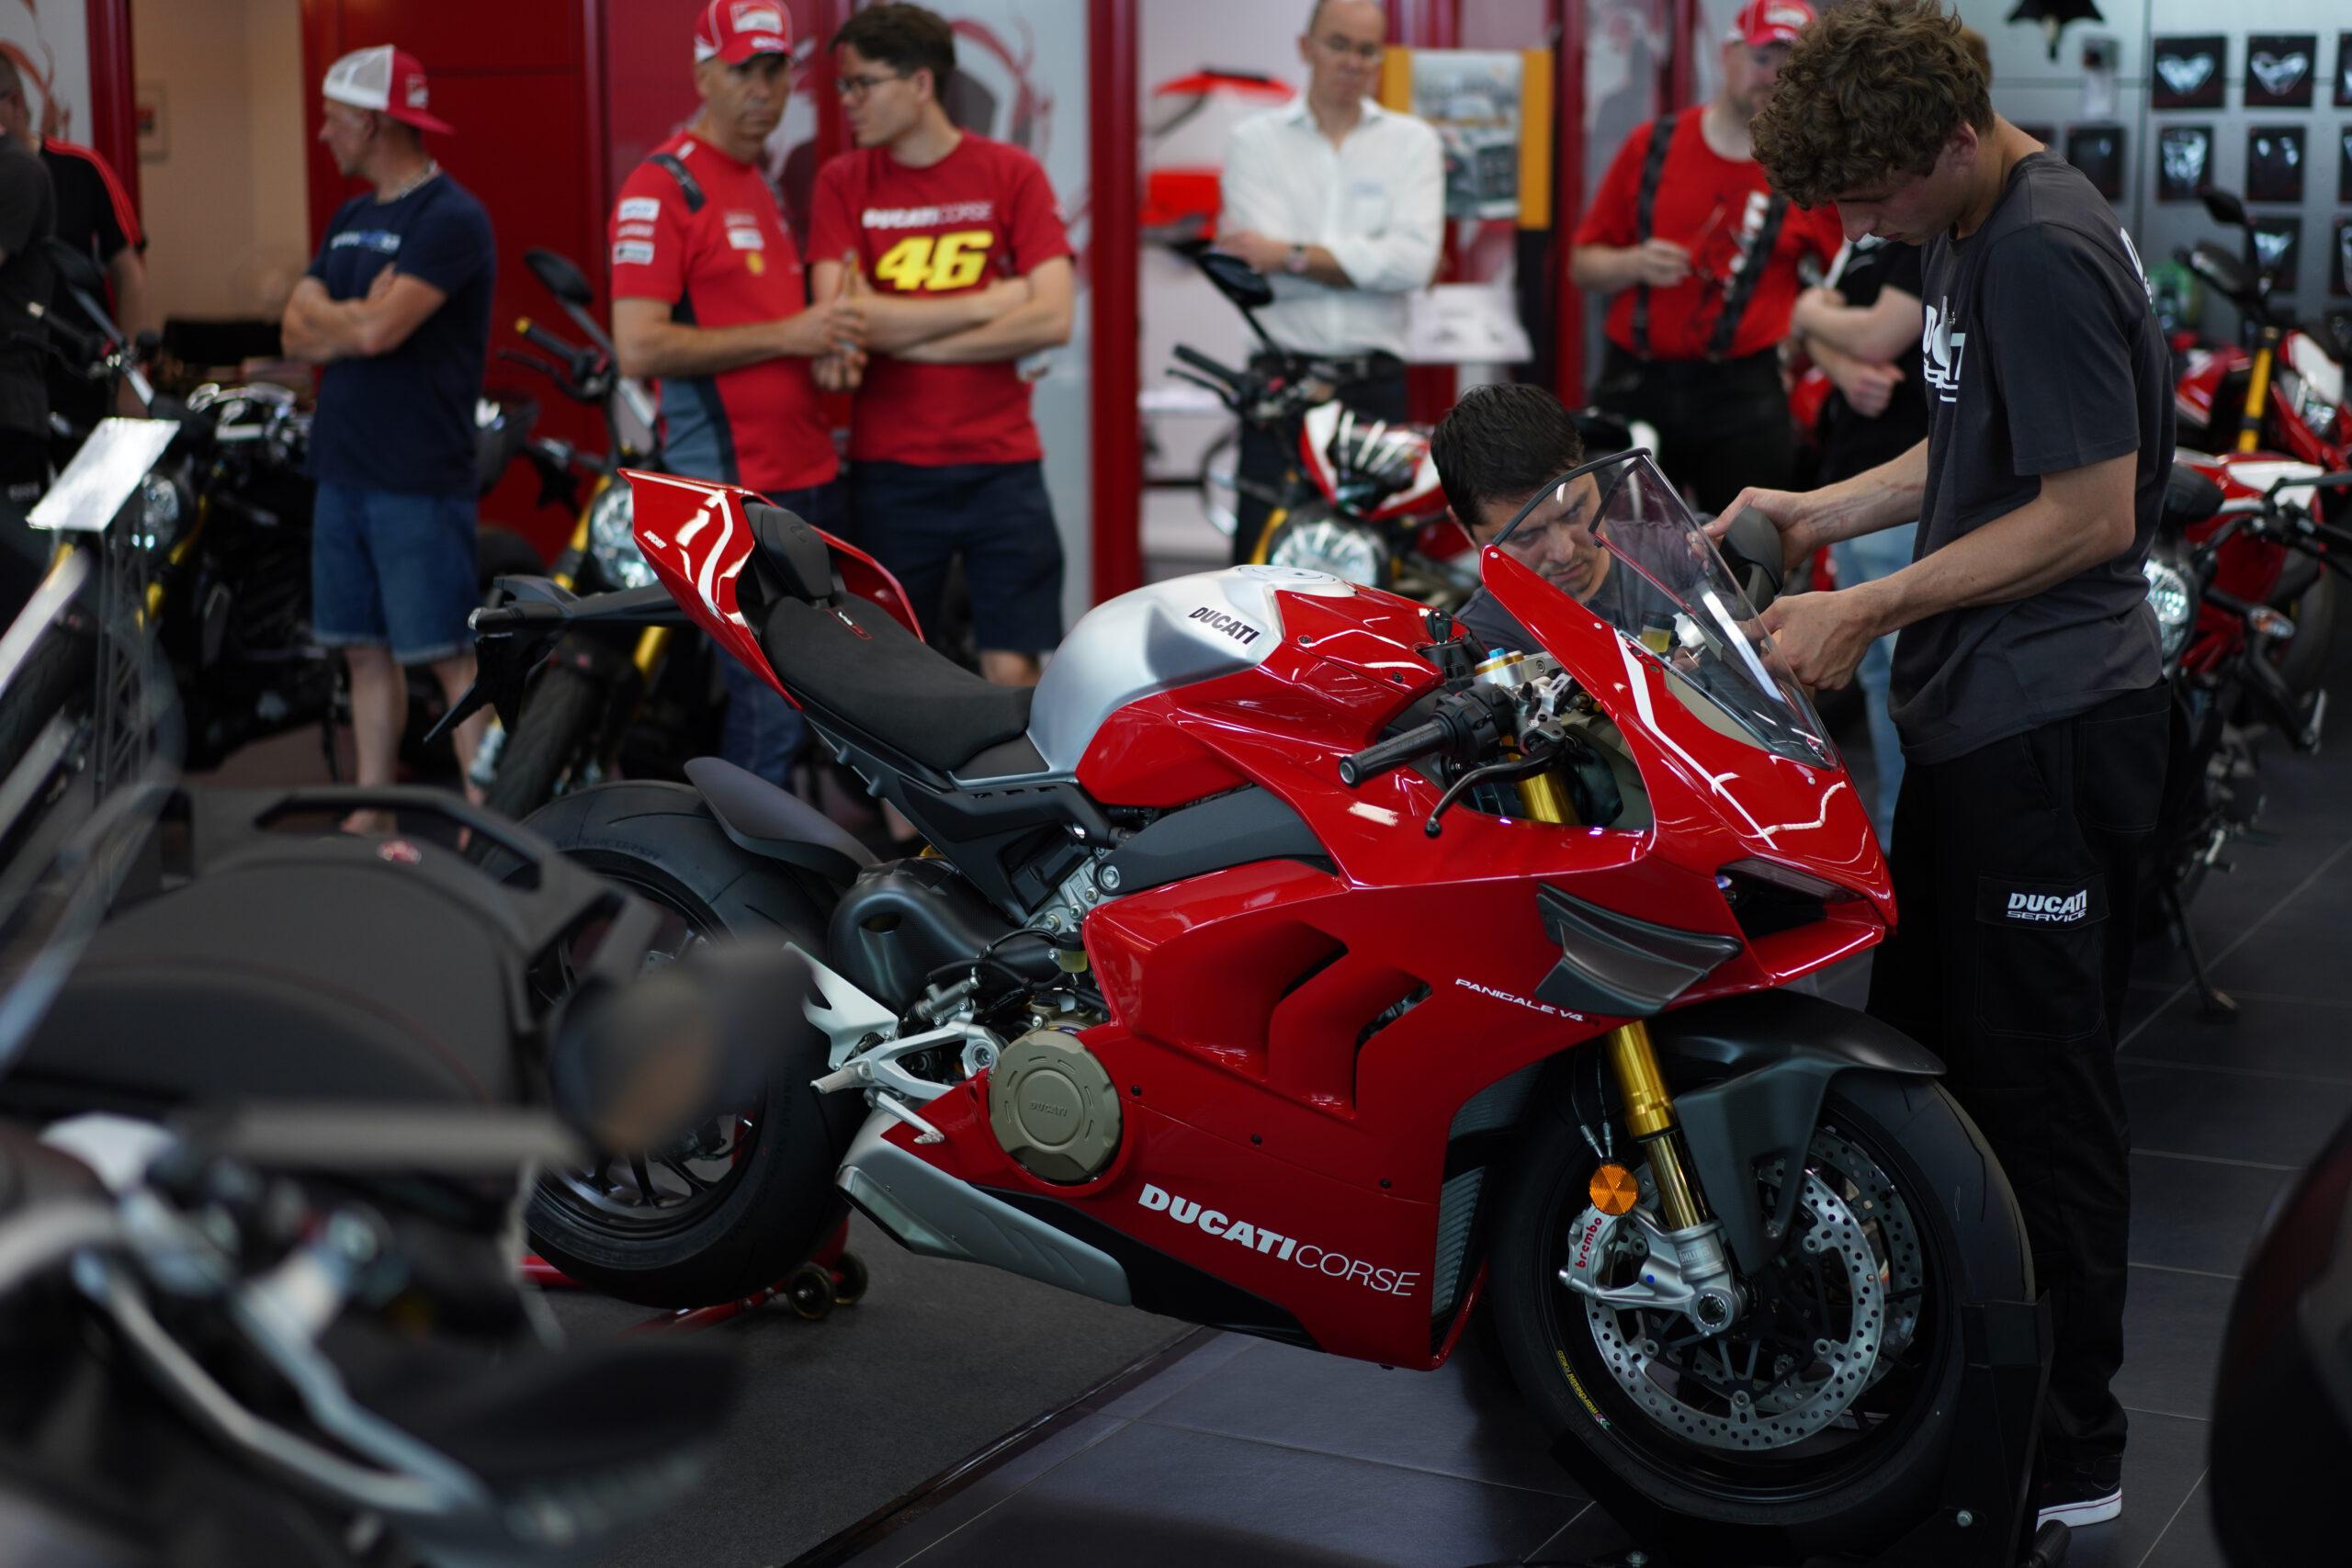 Dein Traum Job bei Ducati Berlin